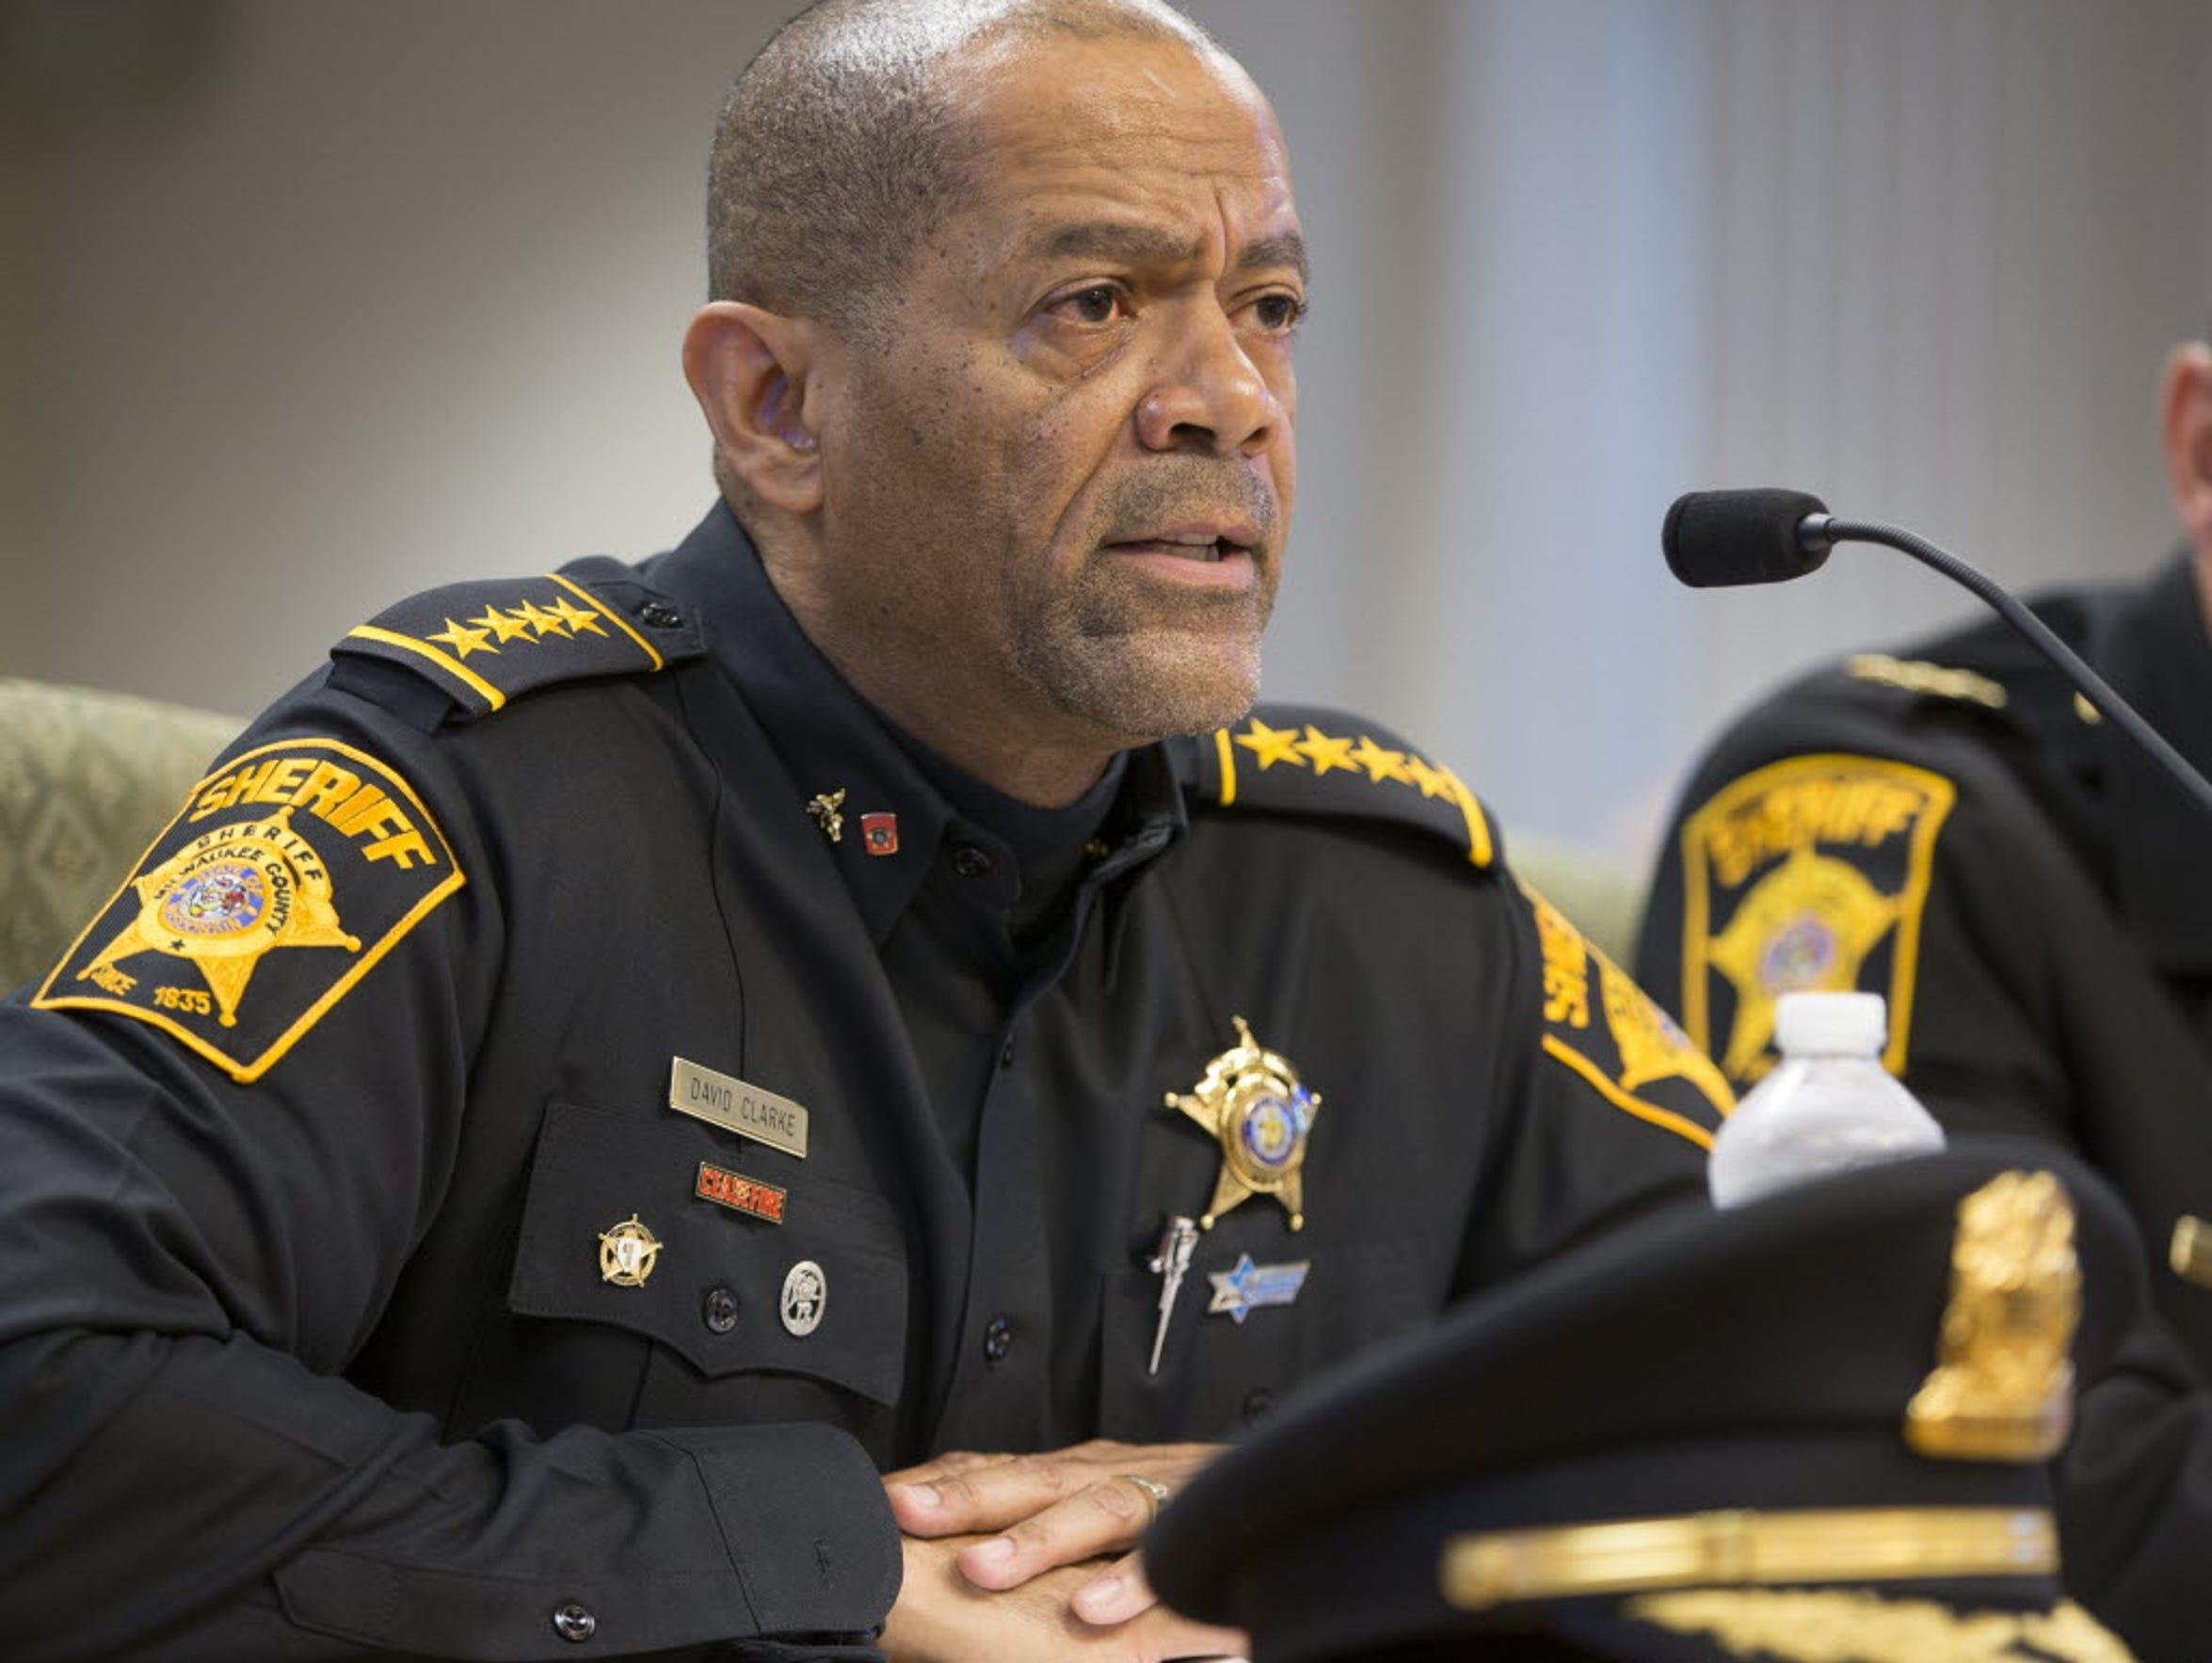 Former Milwaukee County Sheriff David Clarke clashed